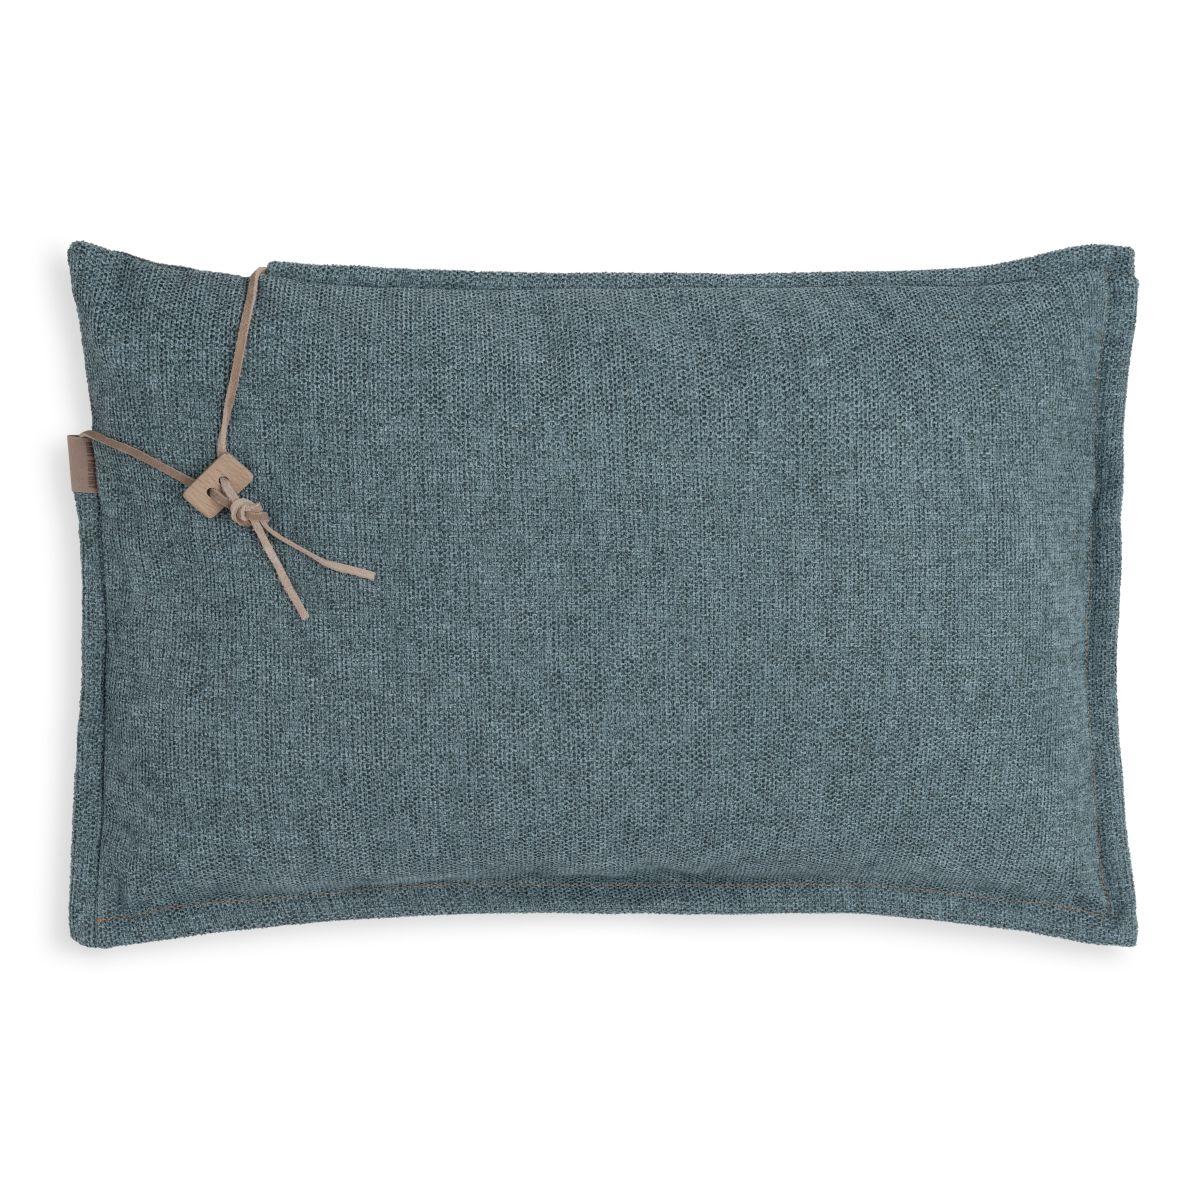 imre cushion jeans 60x40